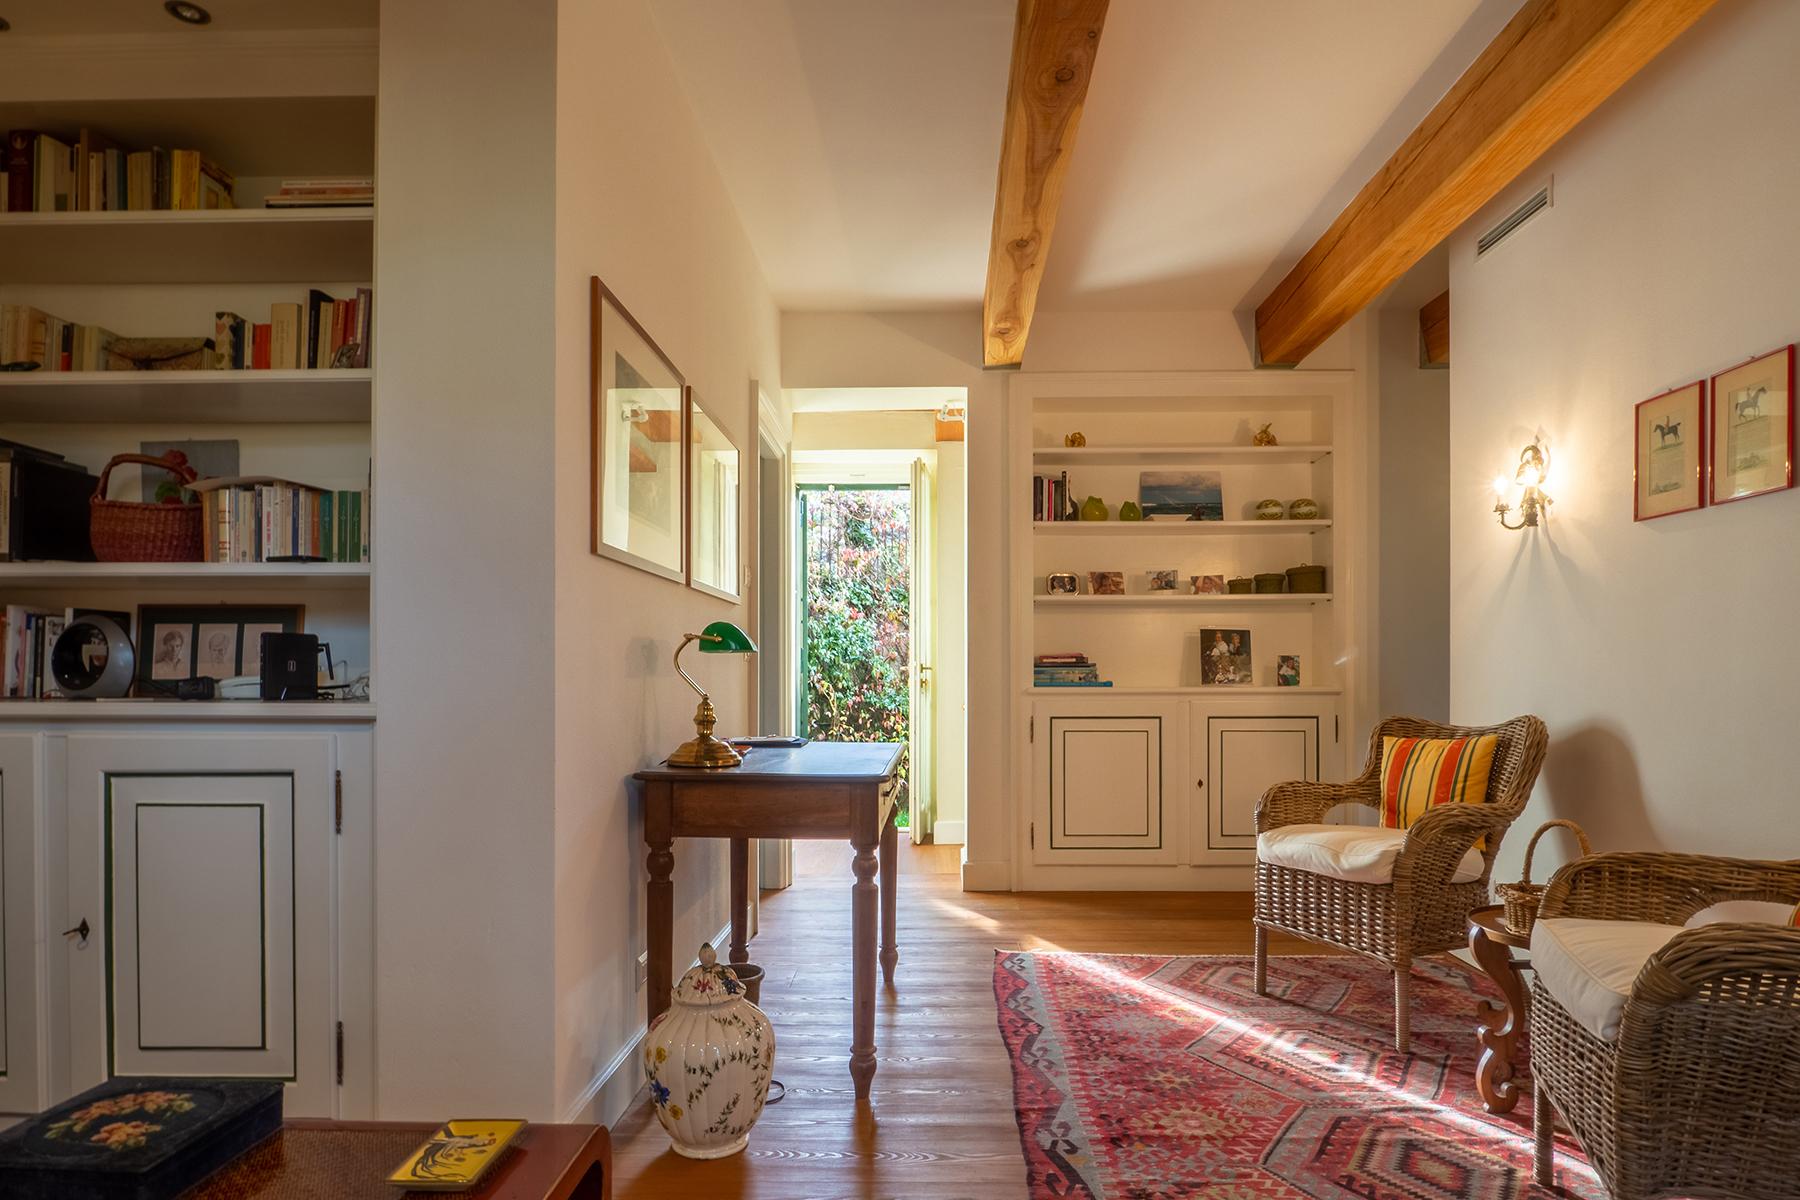 Casa indipendente in Vendita a Torino: 5 locali, 657 mq - Foto 30